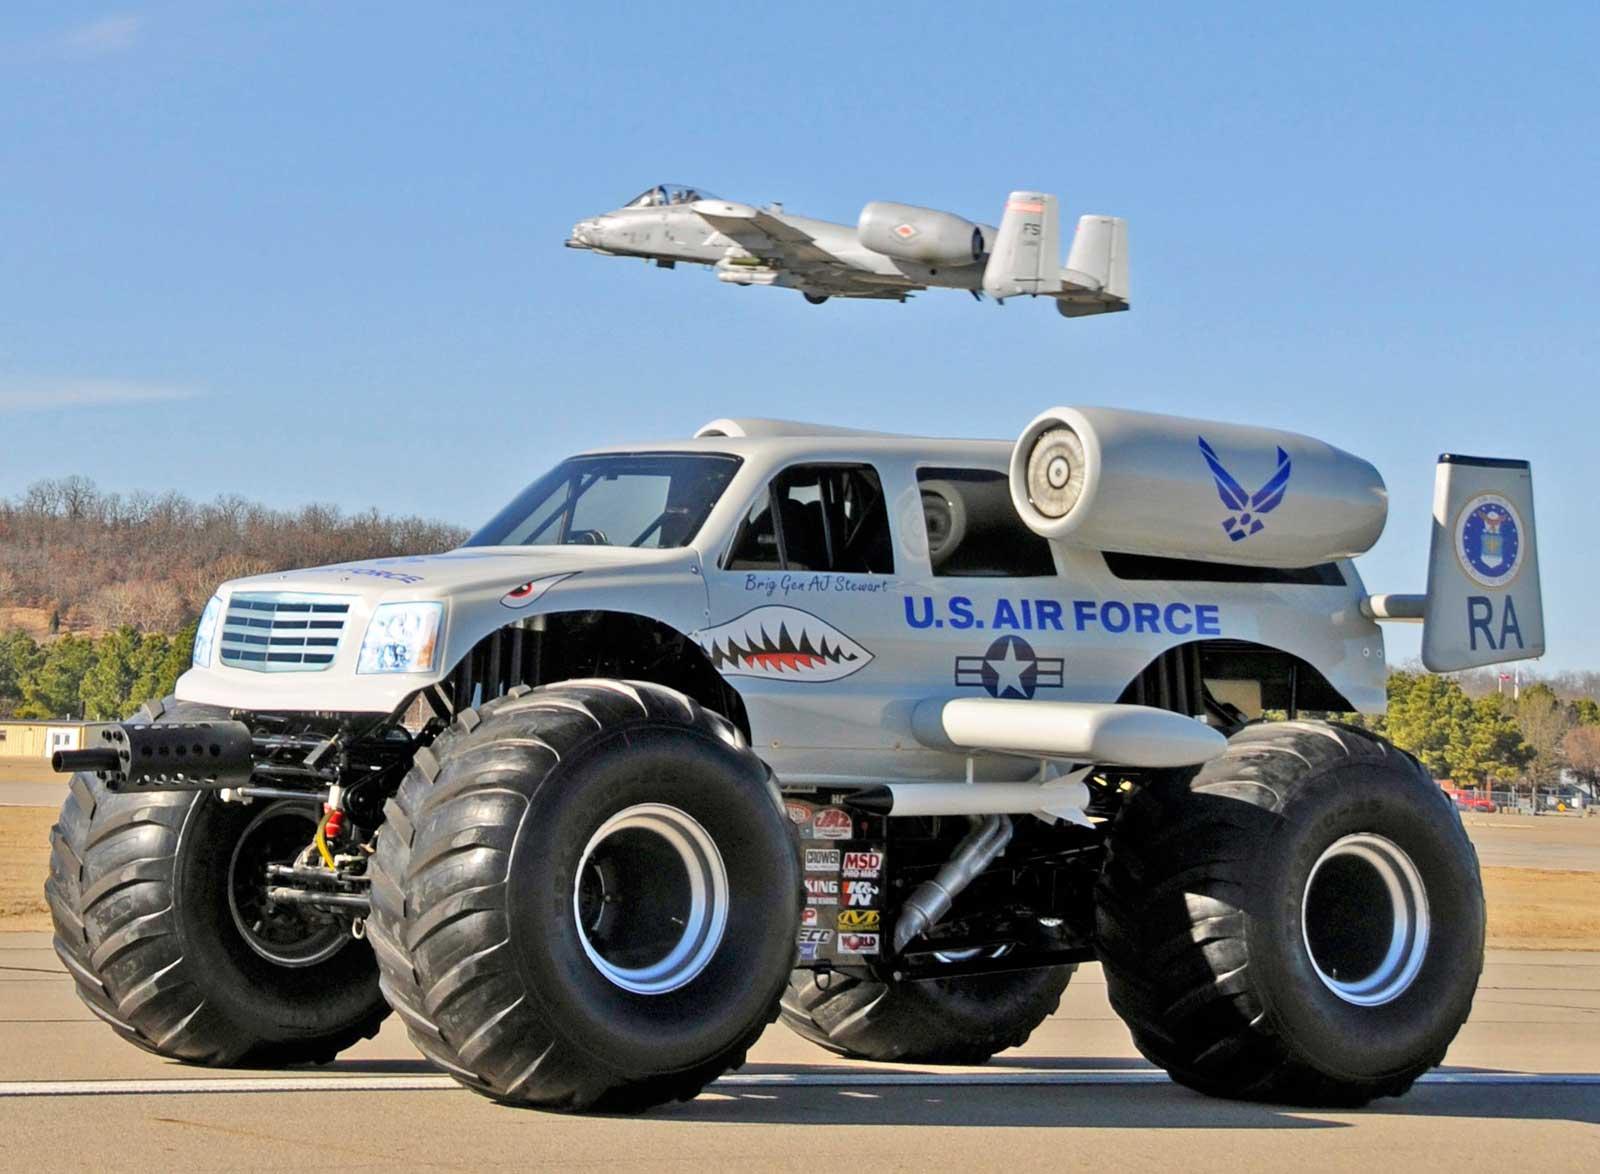 Air Force Monster Truck